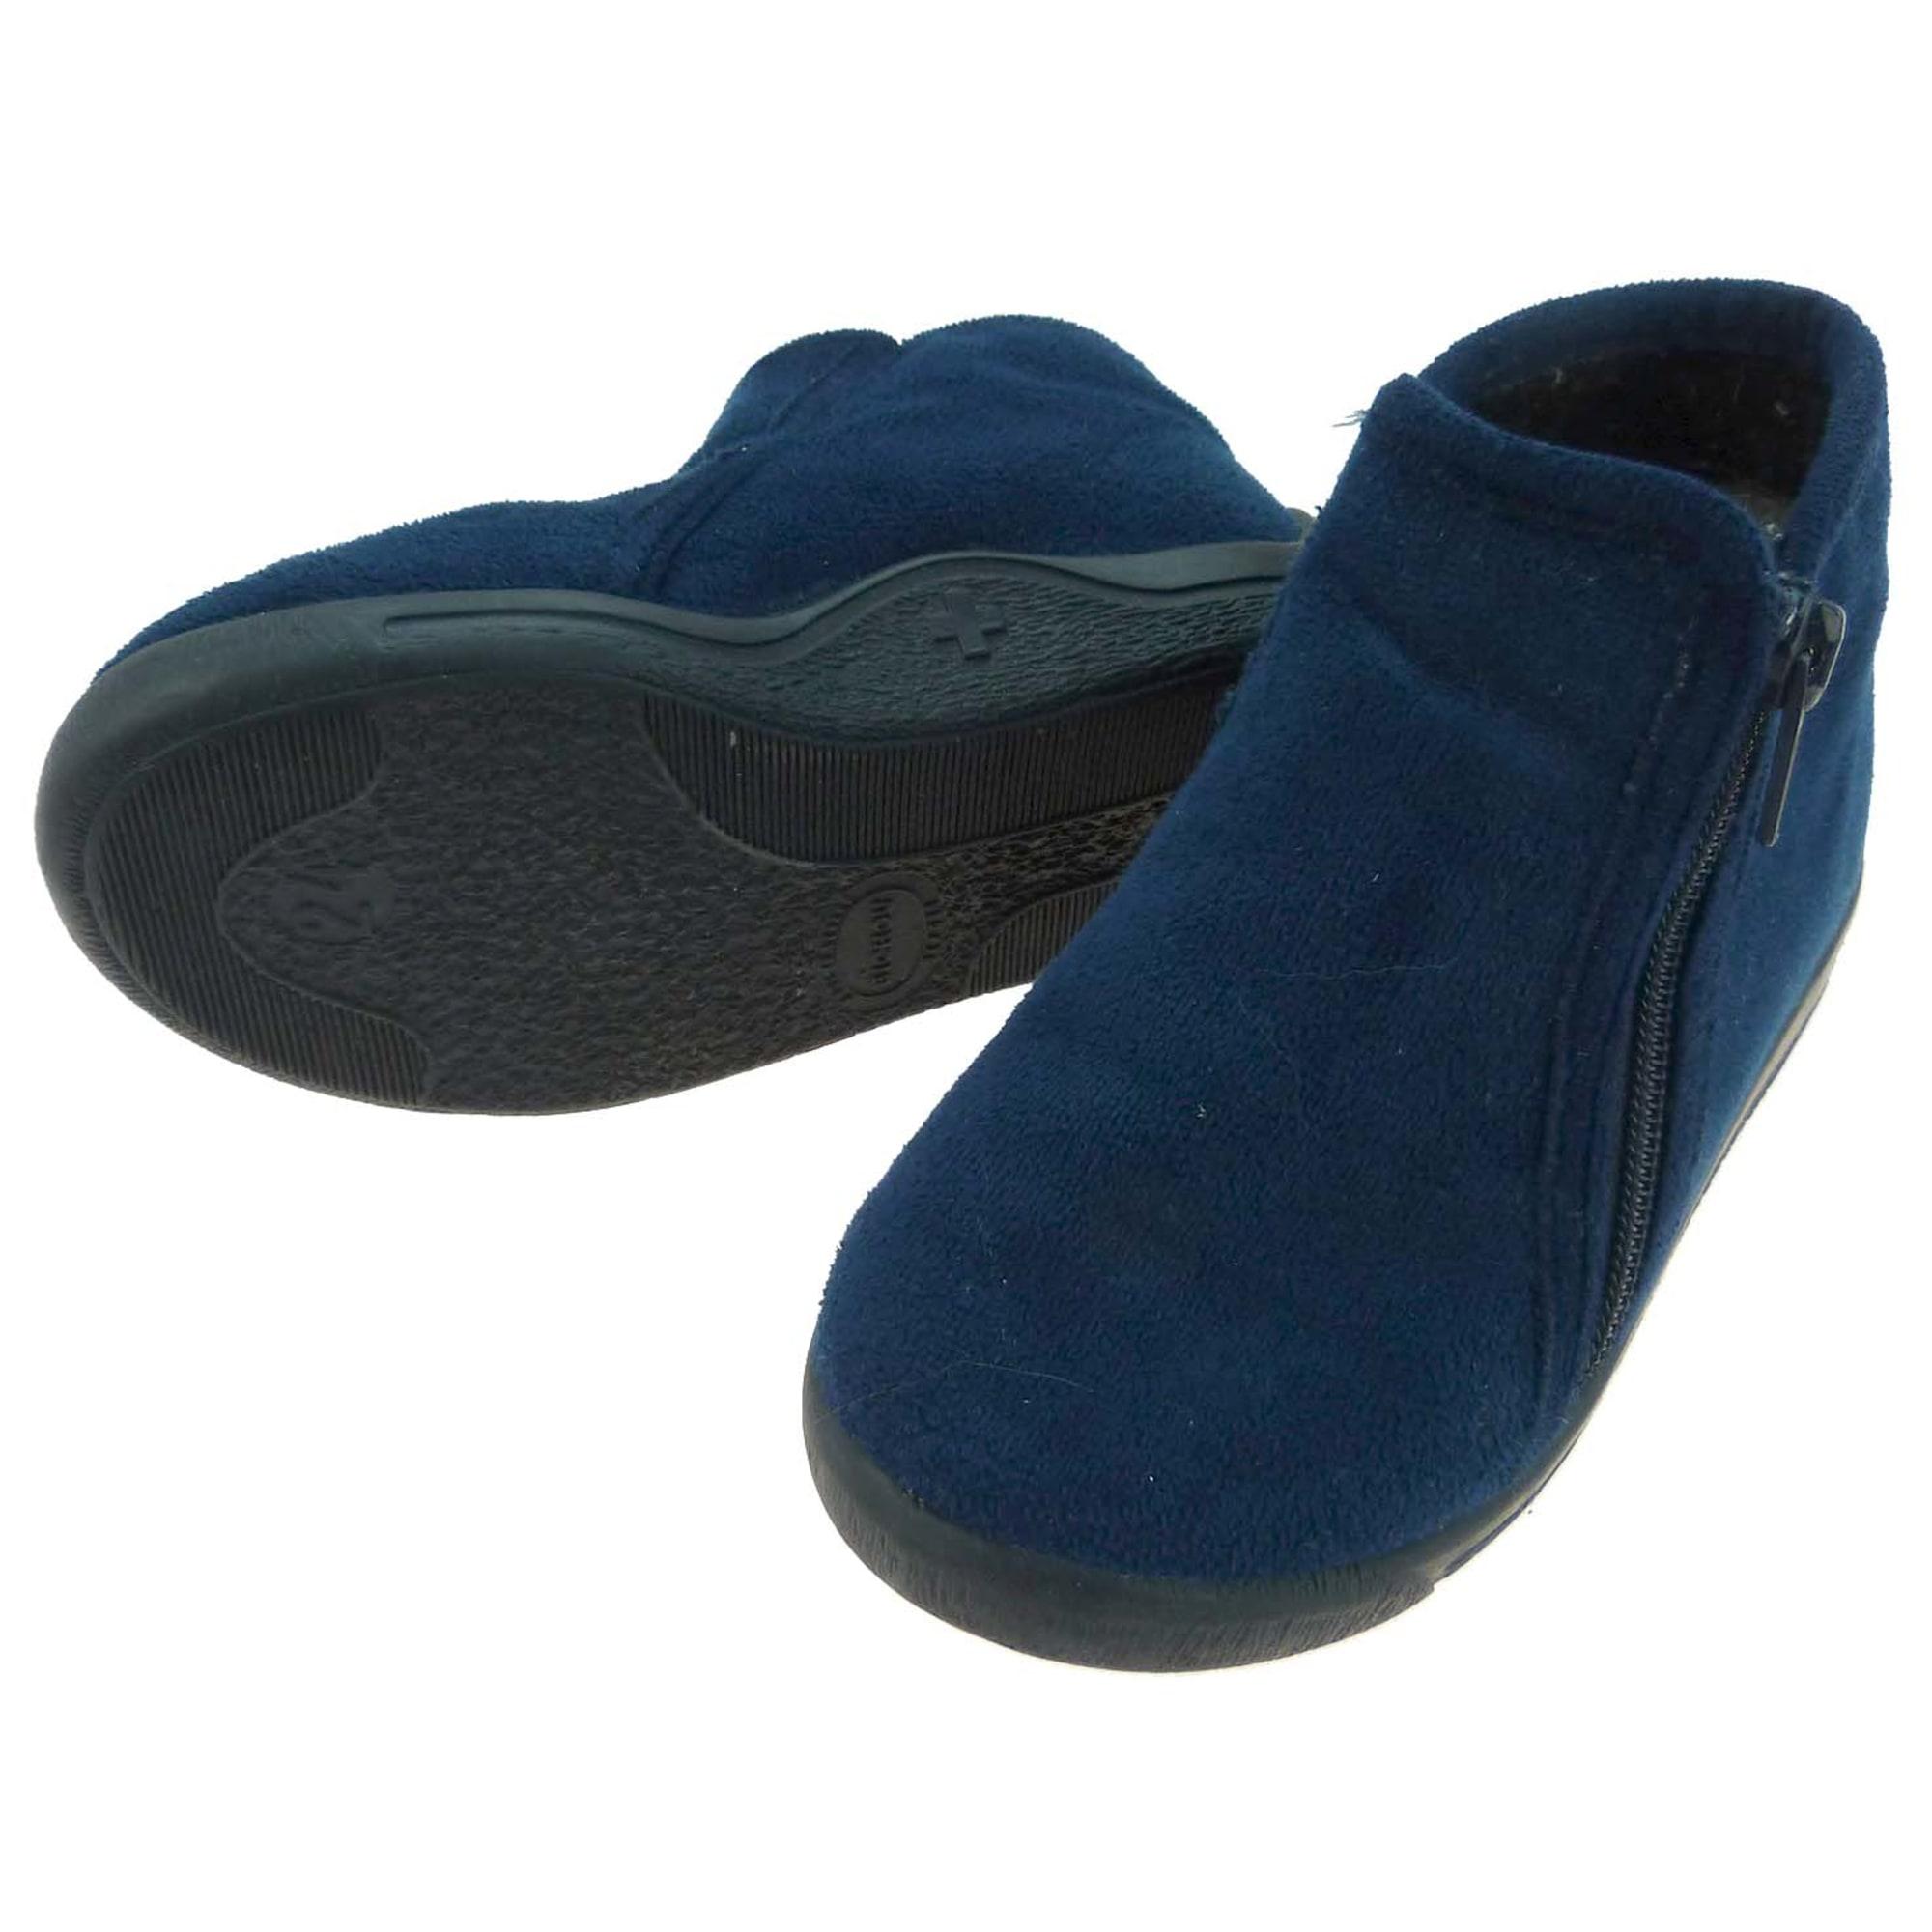 Chaussons & pantoufles  BELLAMY Bleu, bleu marine, bleu turquoise